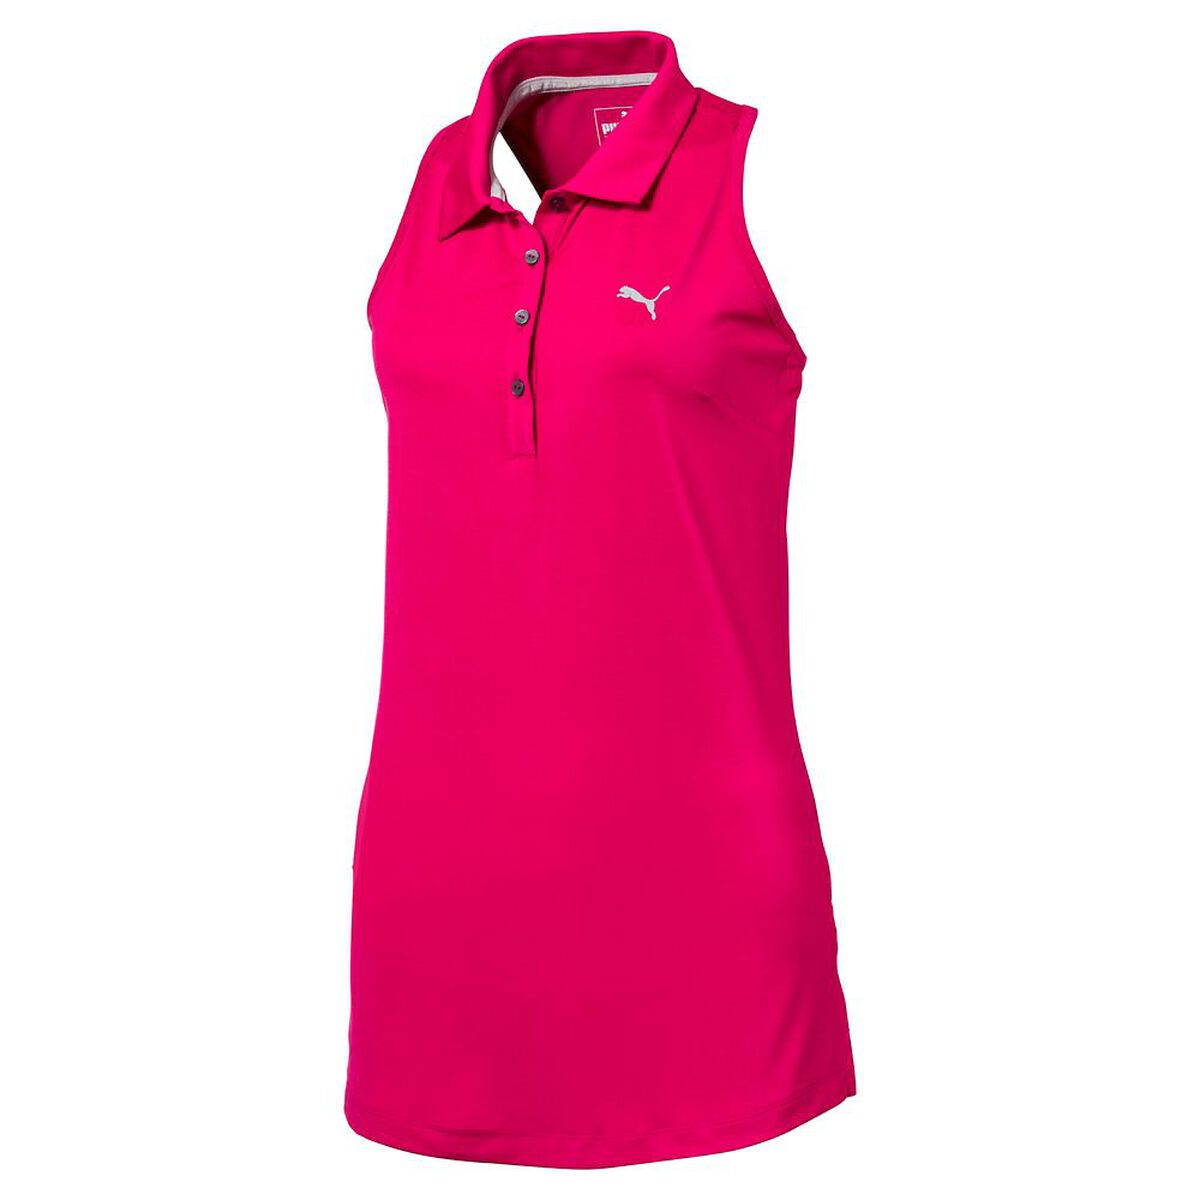 2ebd7eaadee33 Images. Puma Women  39 s Racerback Sleeveless Golf Polo